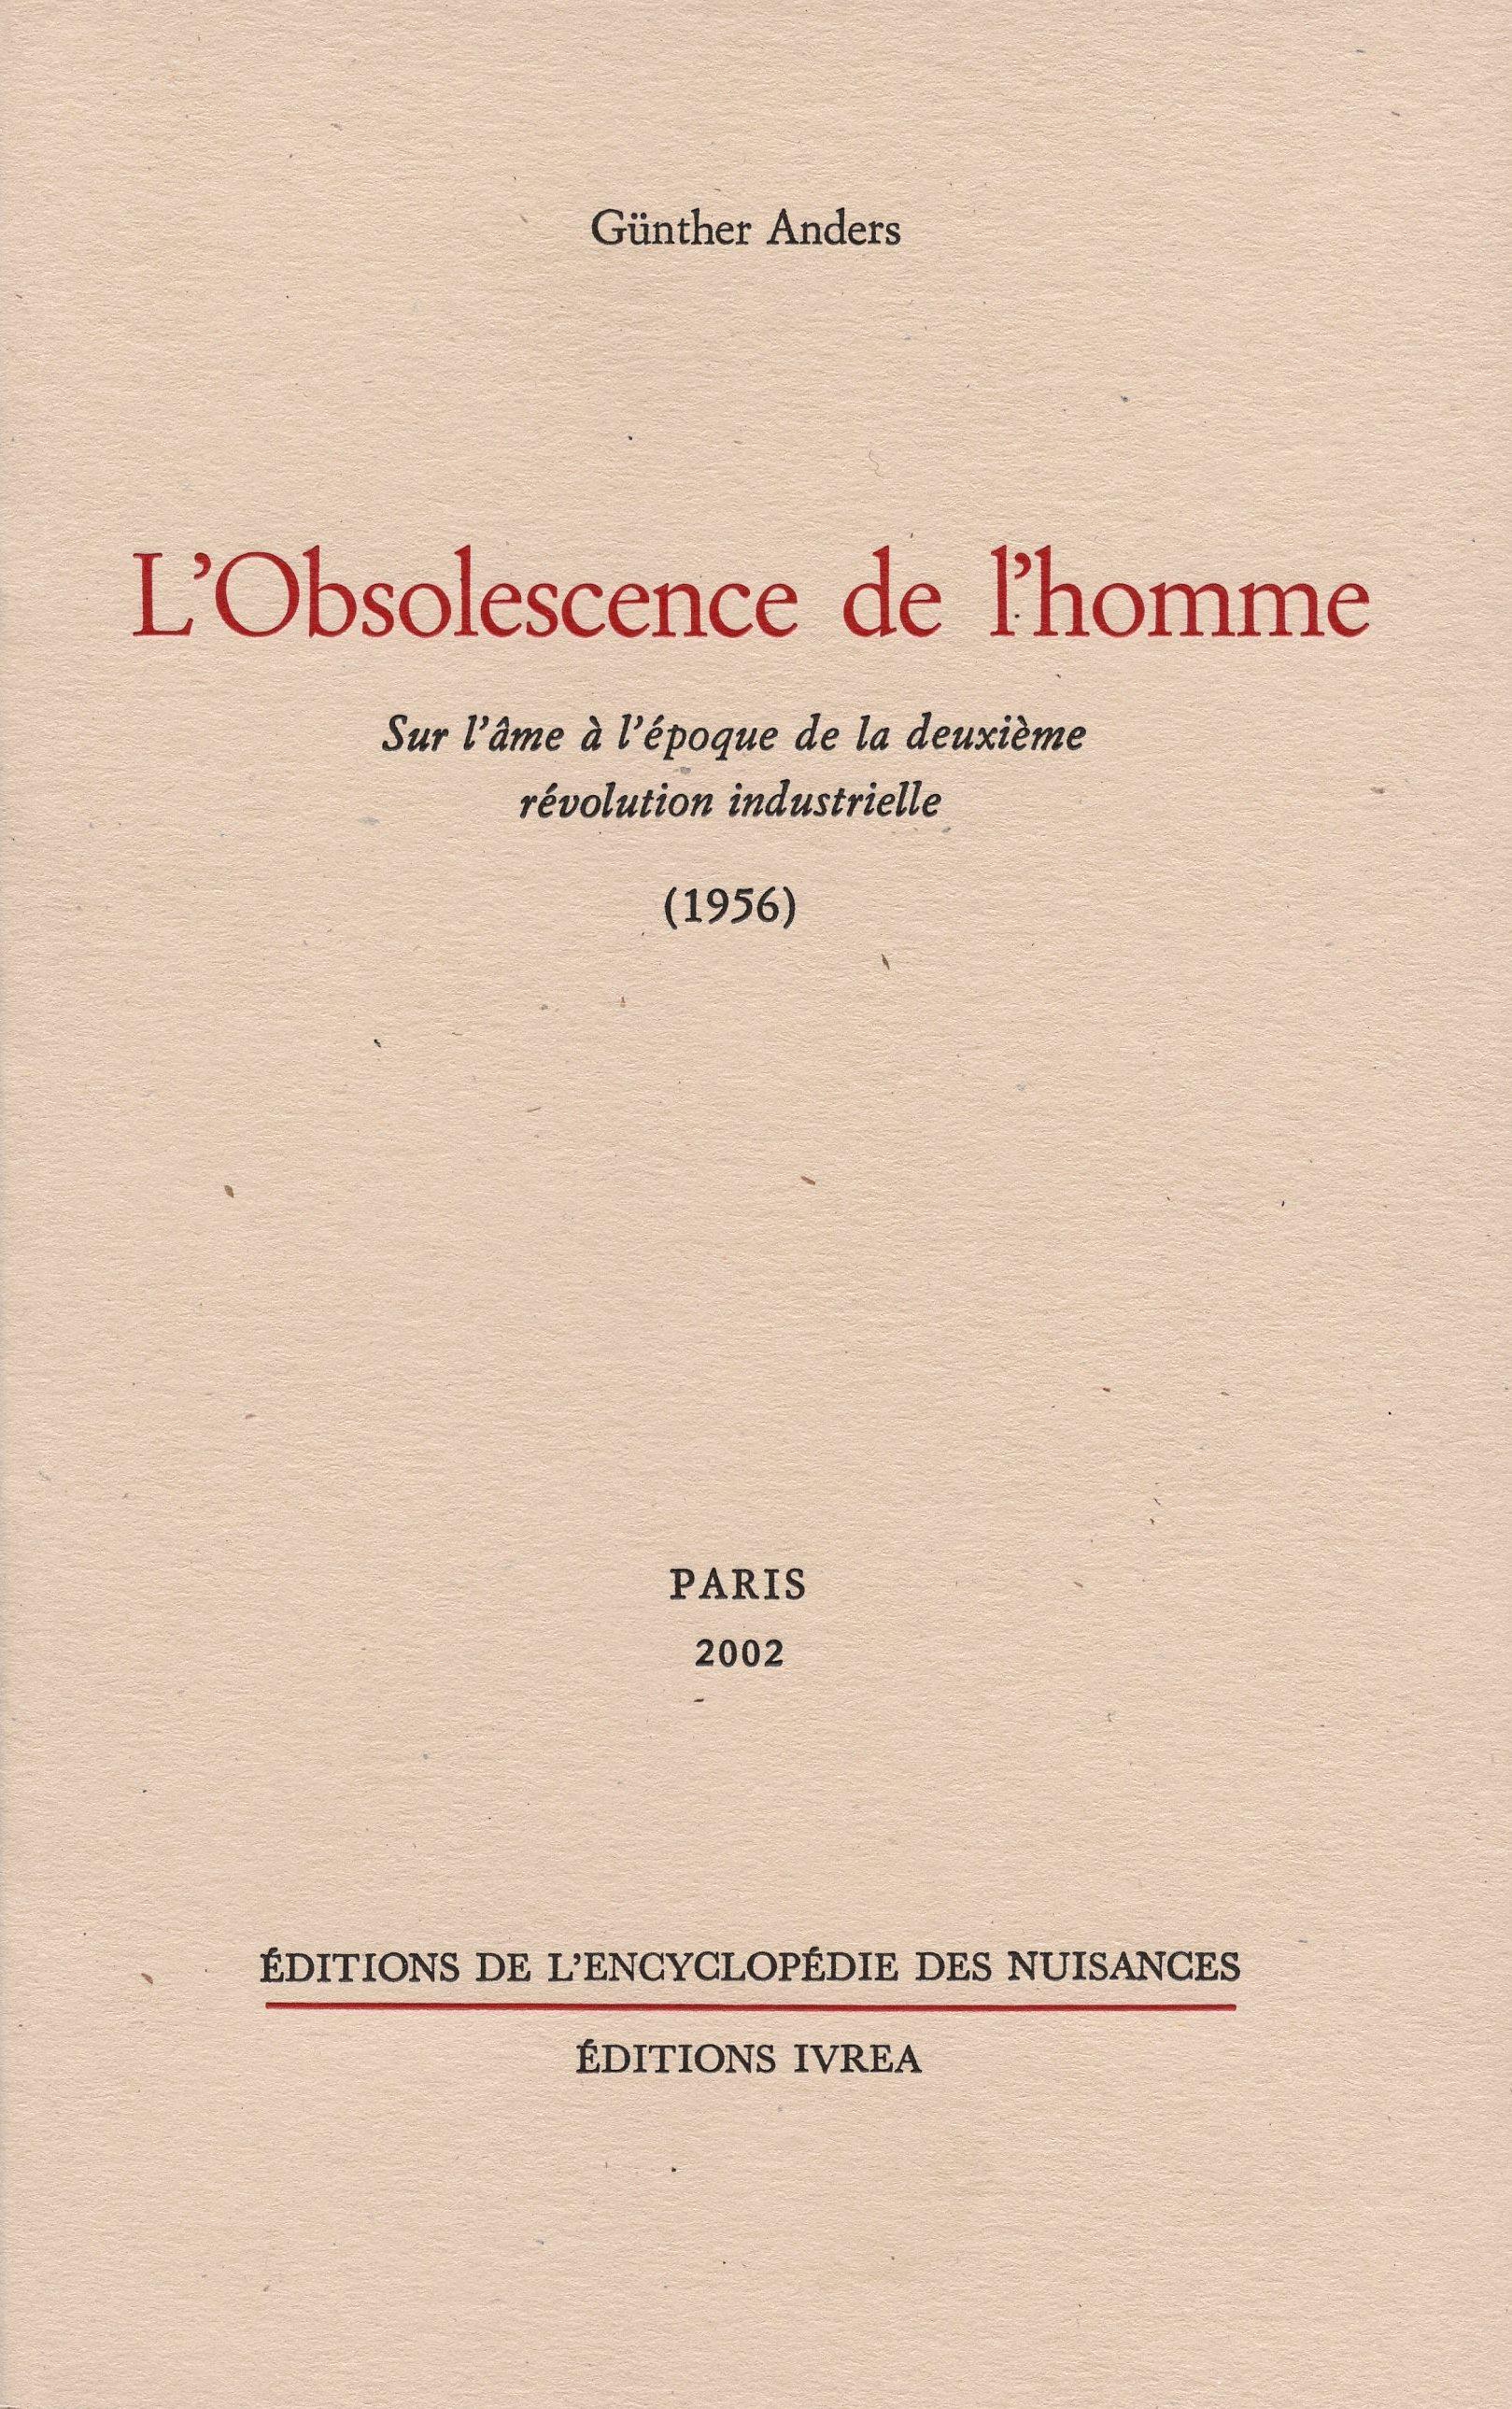 OBSOLESCENCE DE L'HOMME (L')